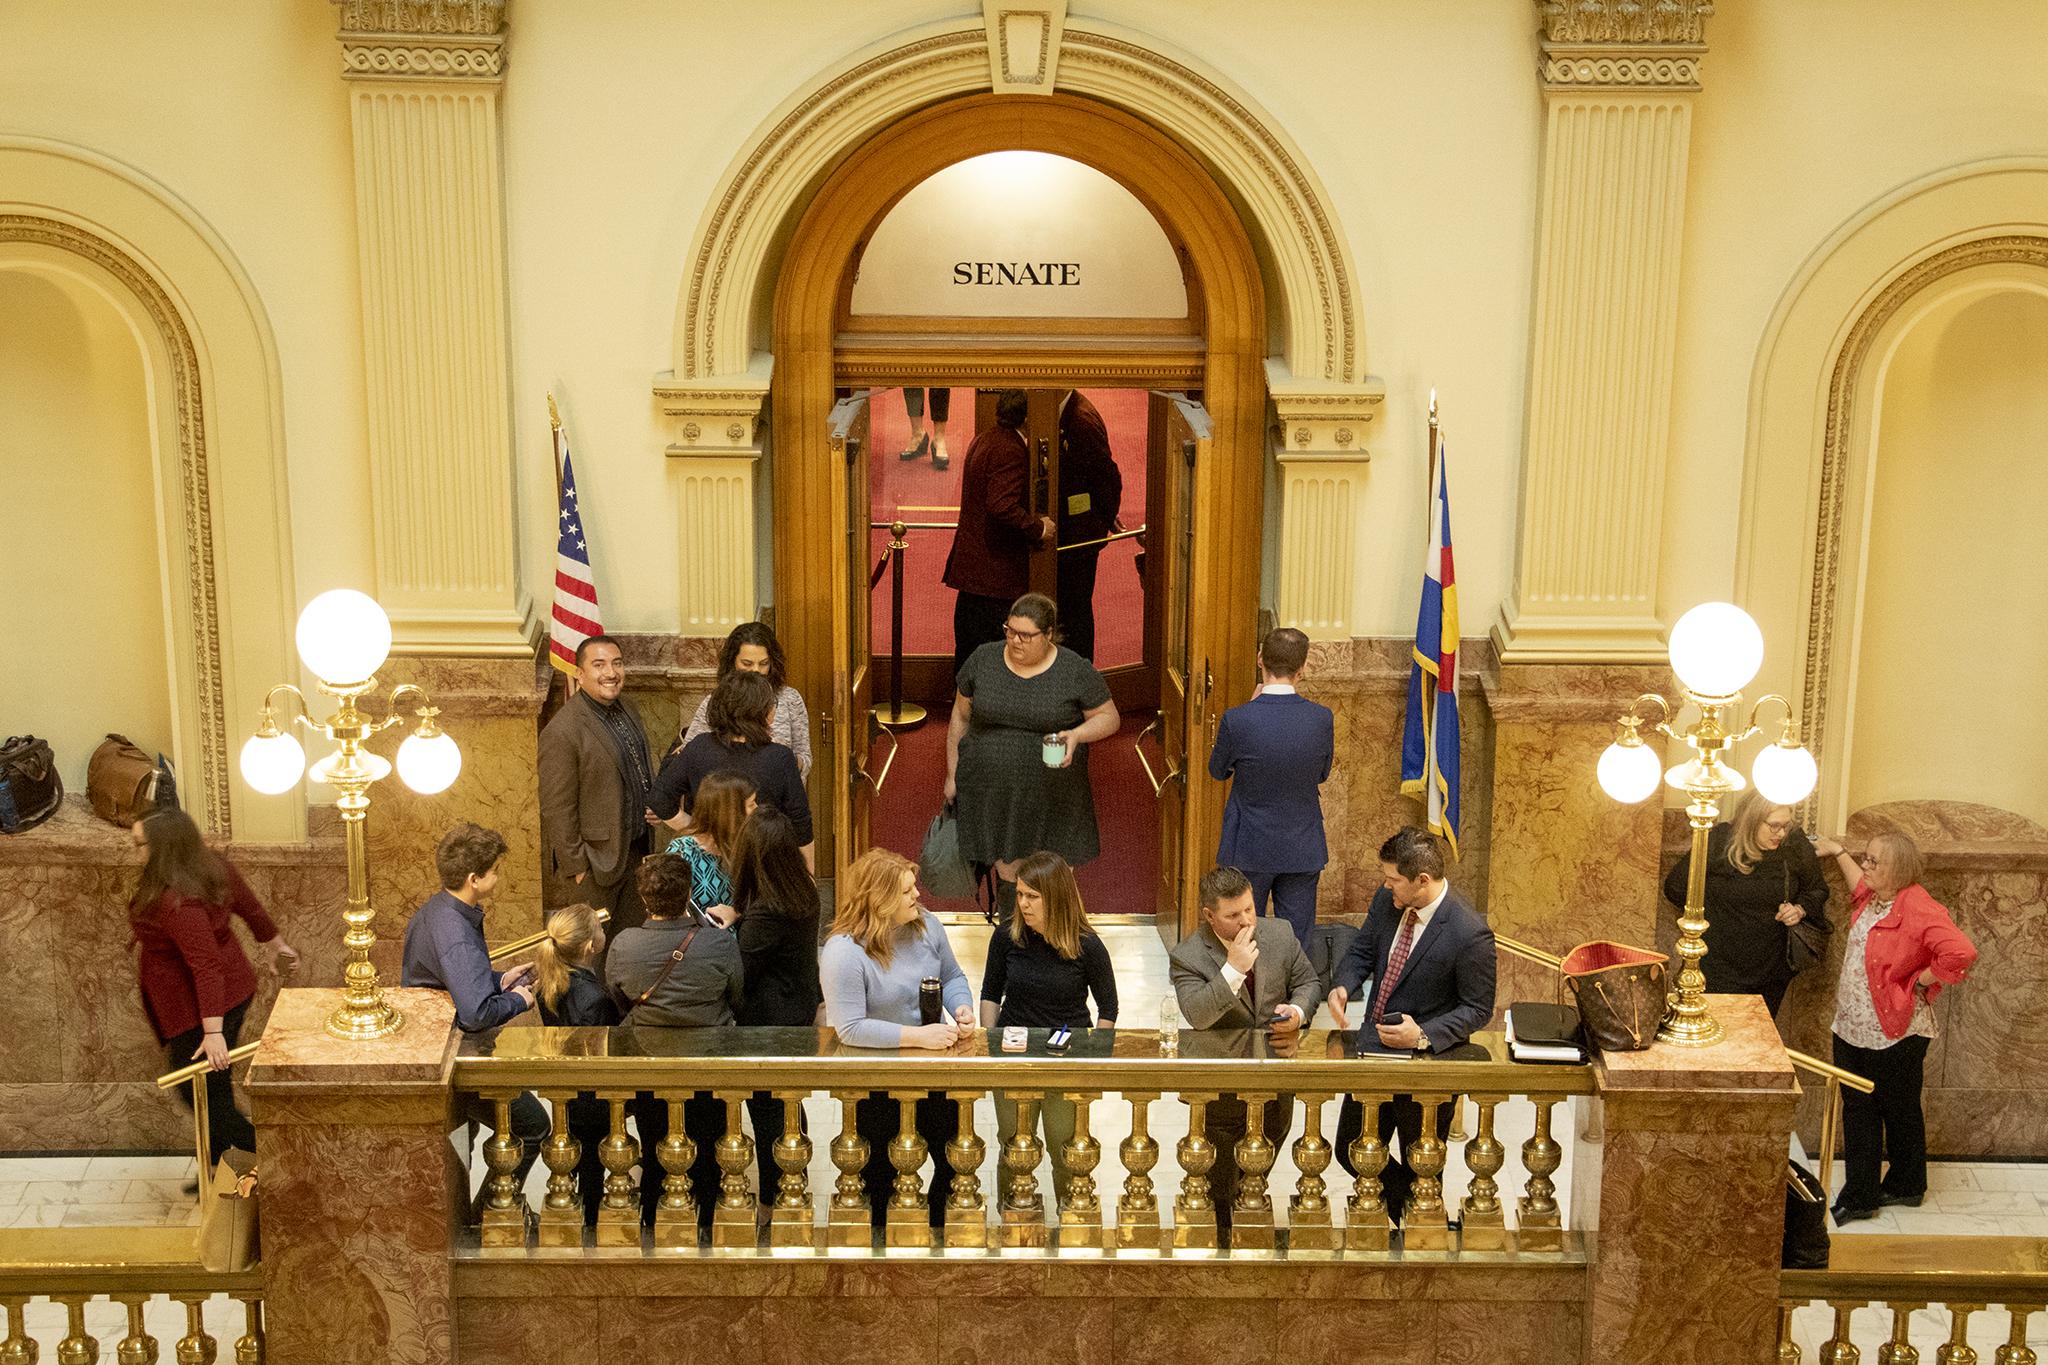 Photo: COLEG 2019 | Senate Chamber Door Crowd - KBeaty